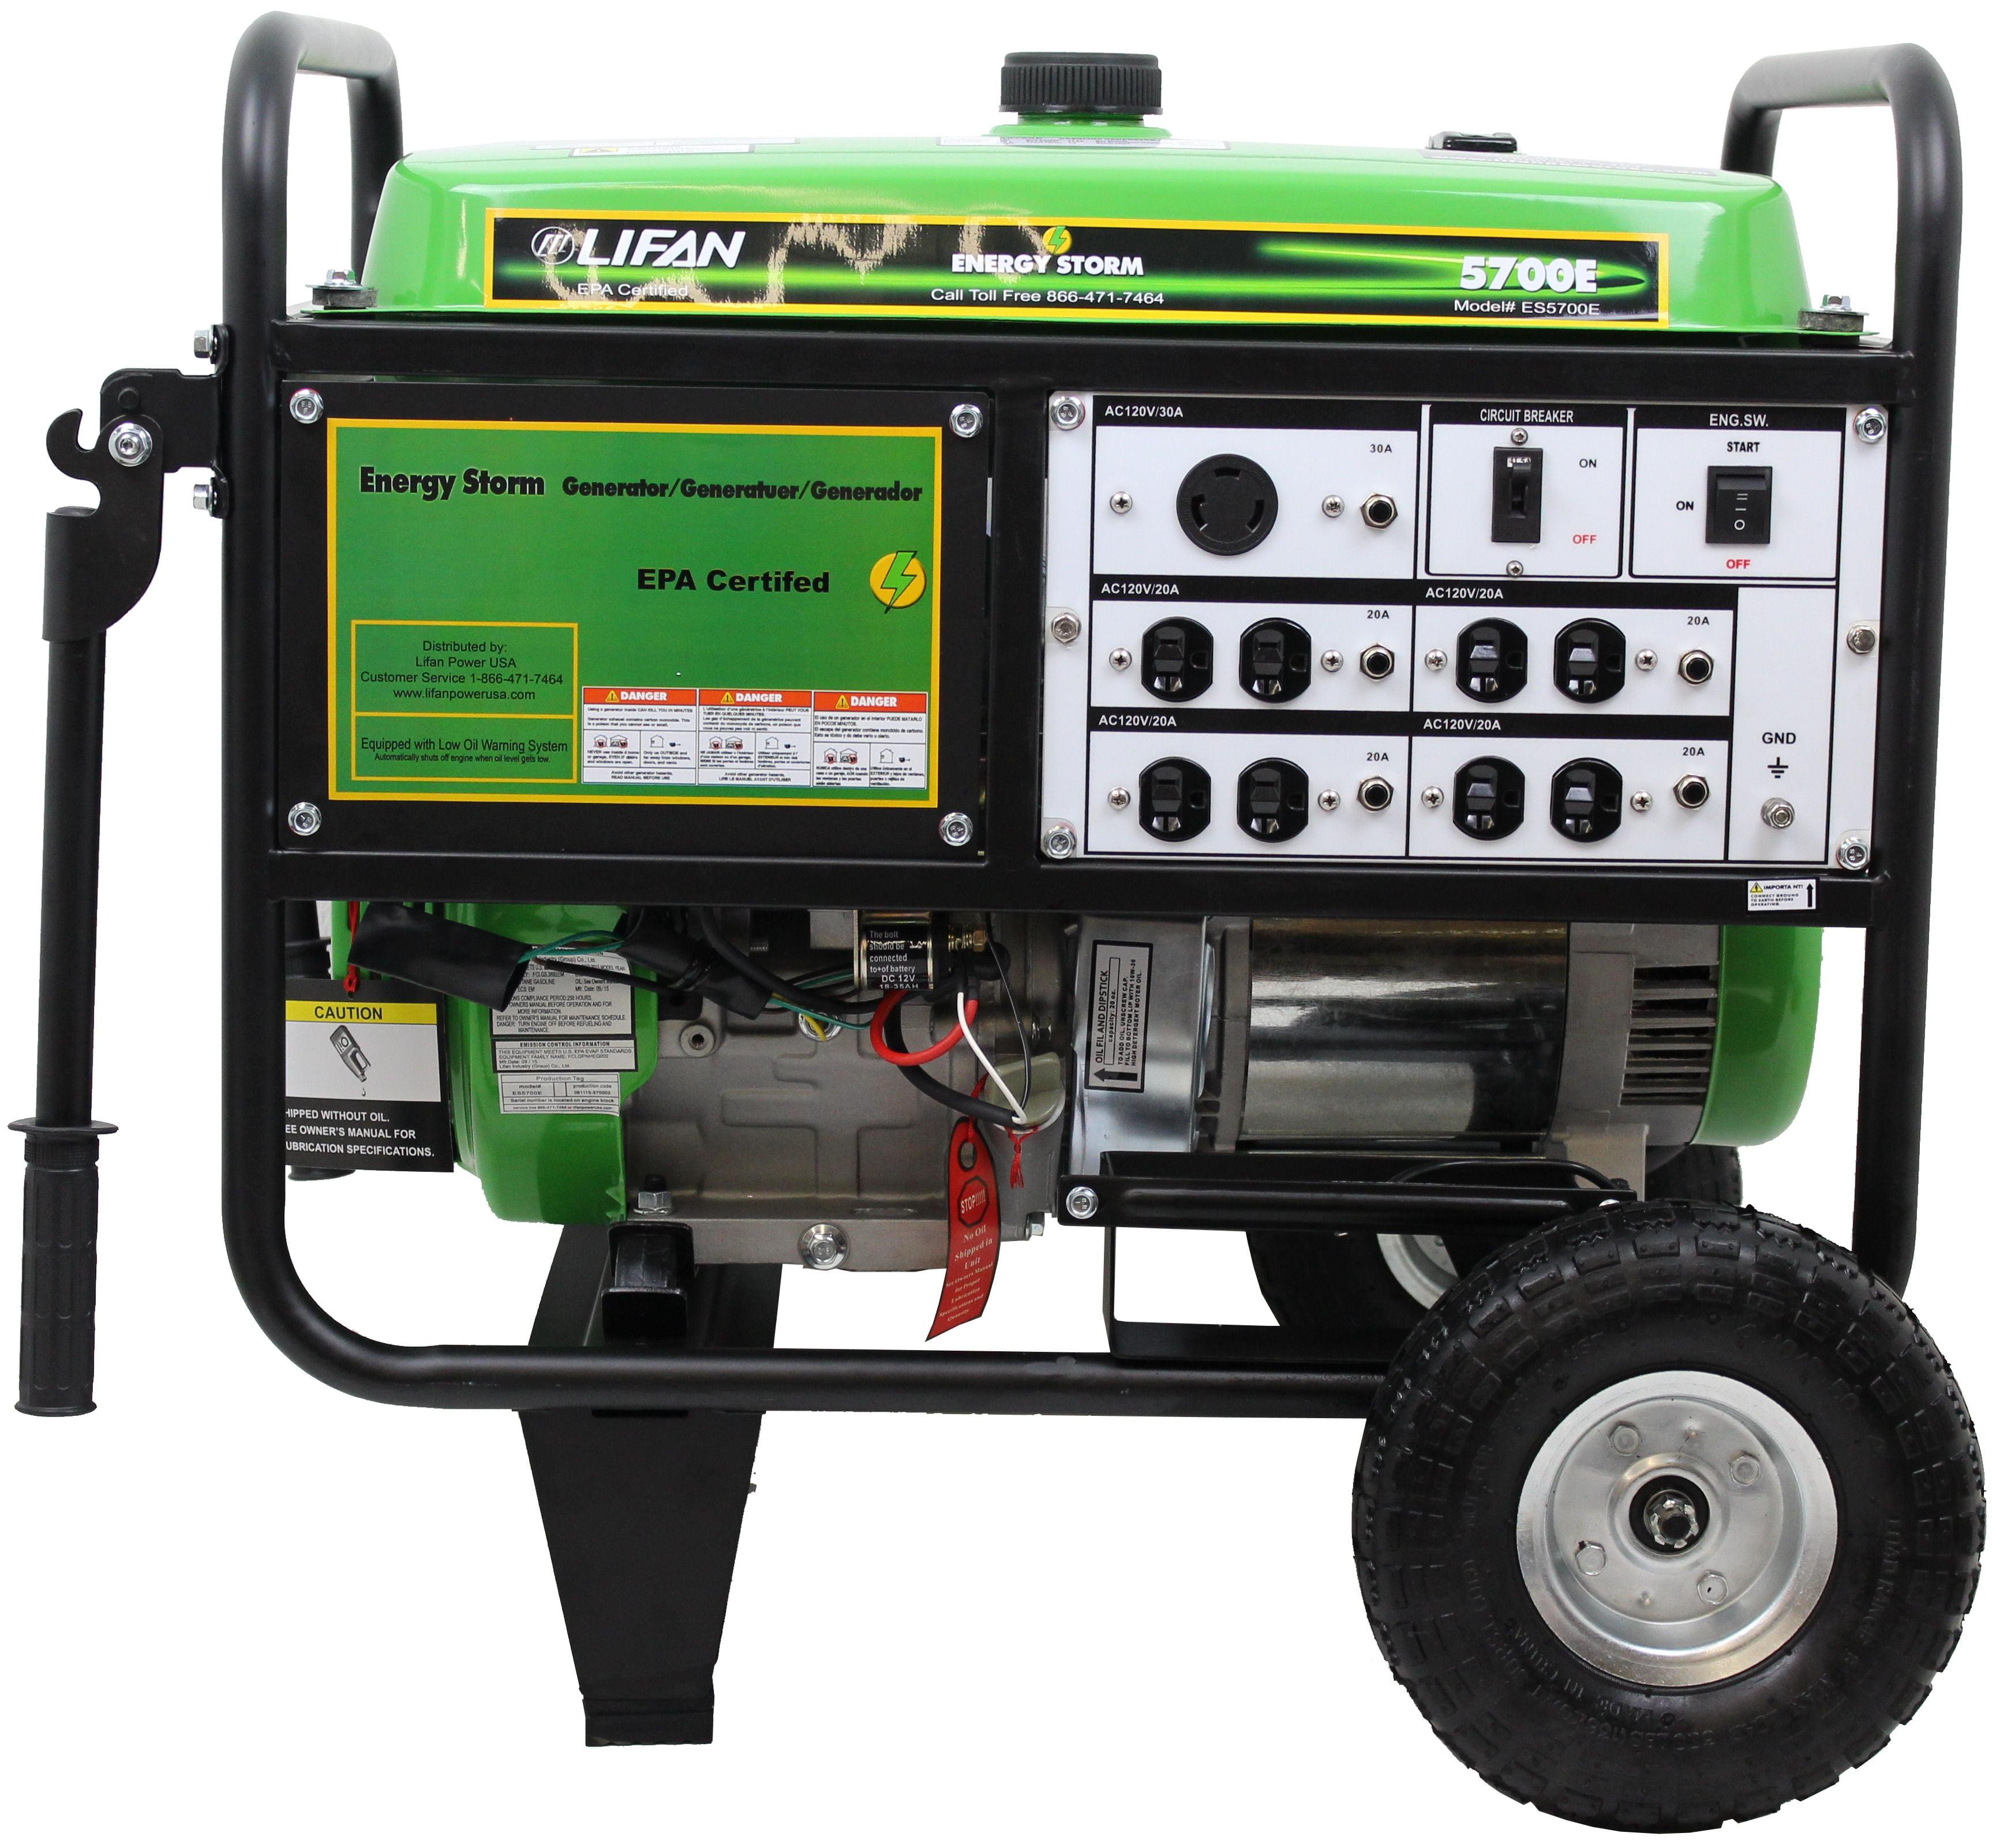 Lifan Energy Storm 5700E, 13hp 389cc, 4-Stroke Industrial Grade, Keyless  Push Button Electric/Recoil Start, Gasoline Powered Portable Generator -  Walmart.com - Walmart.comWalmart